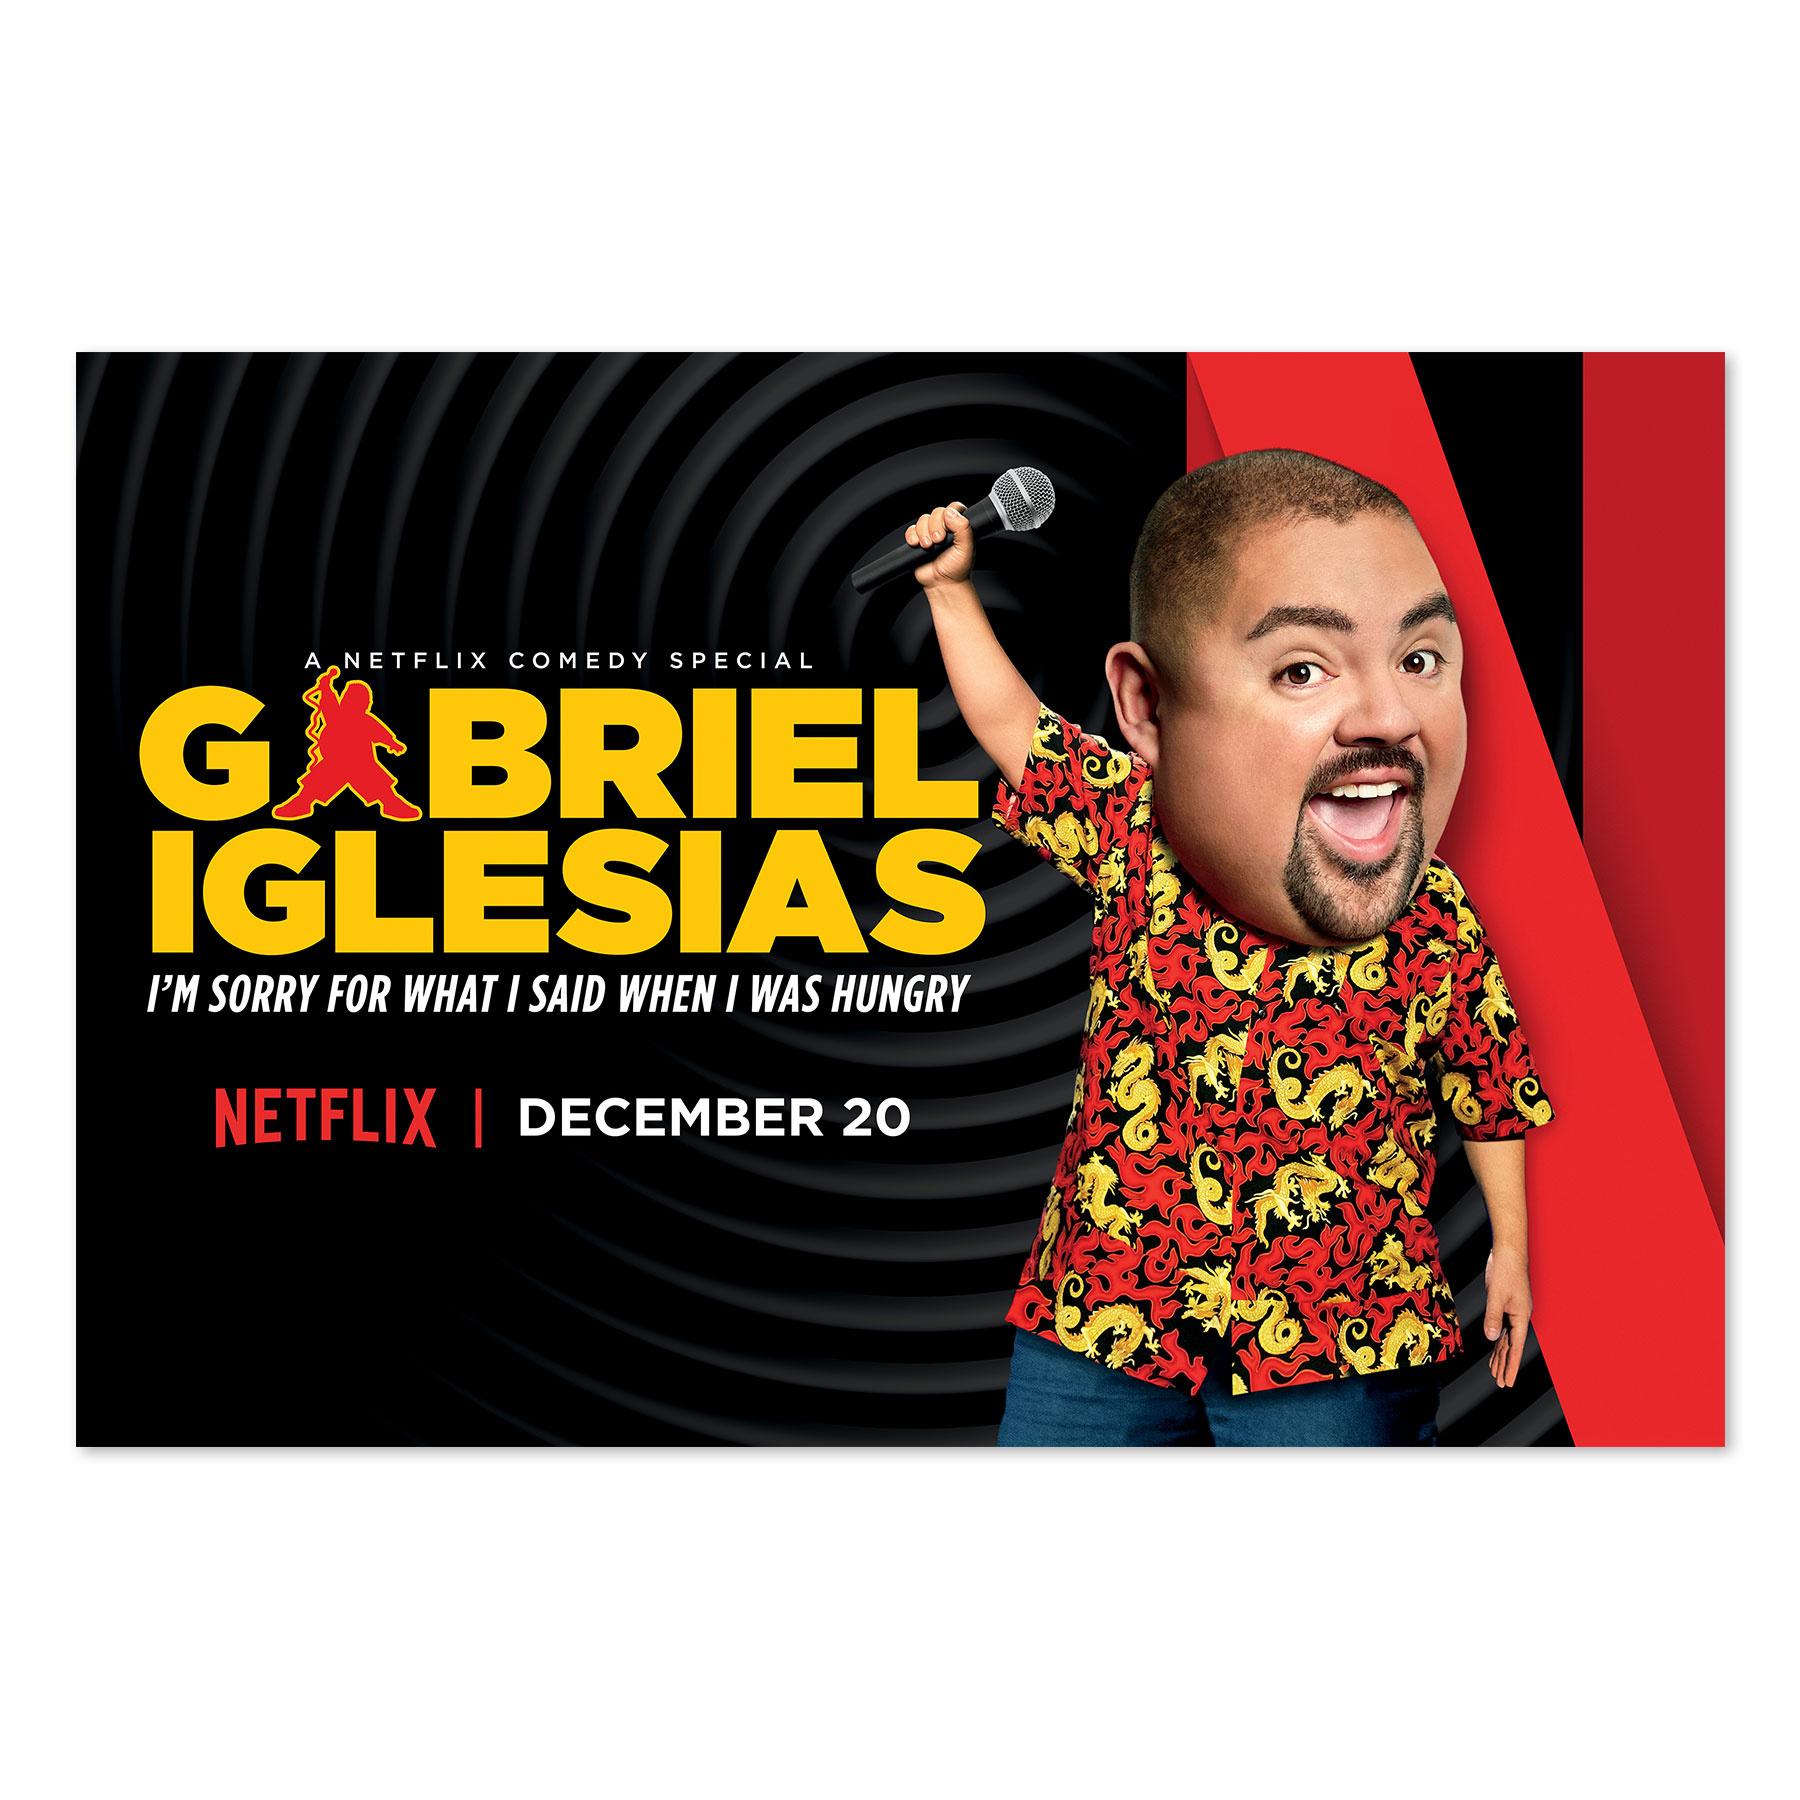 Gabriel Iglesias Digital Banner for Netflix